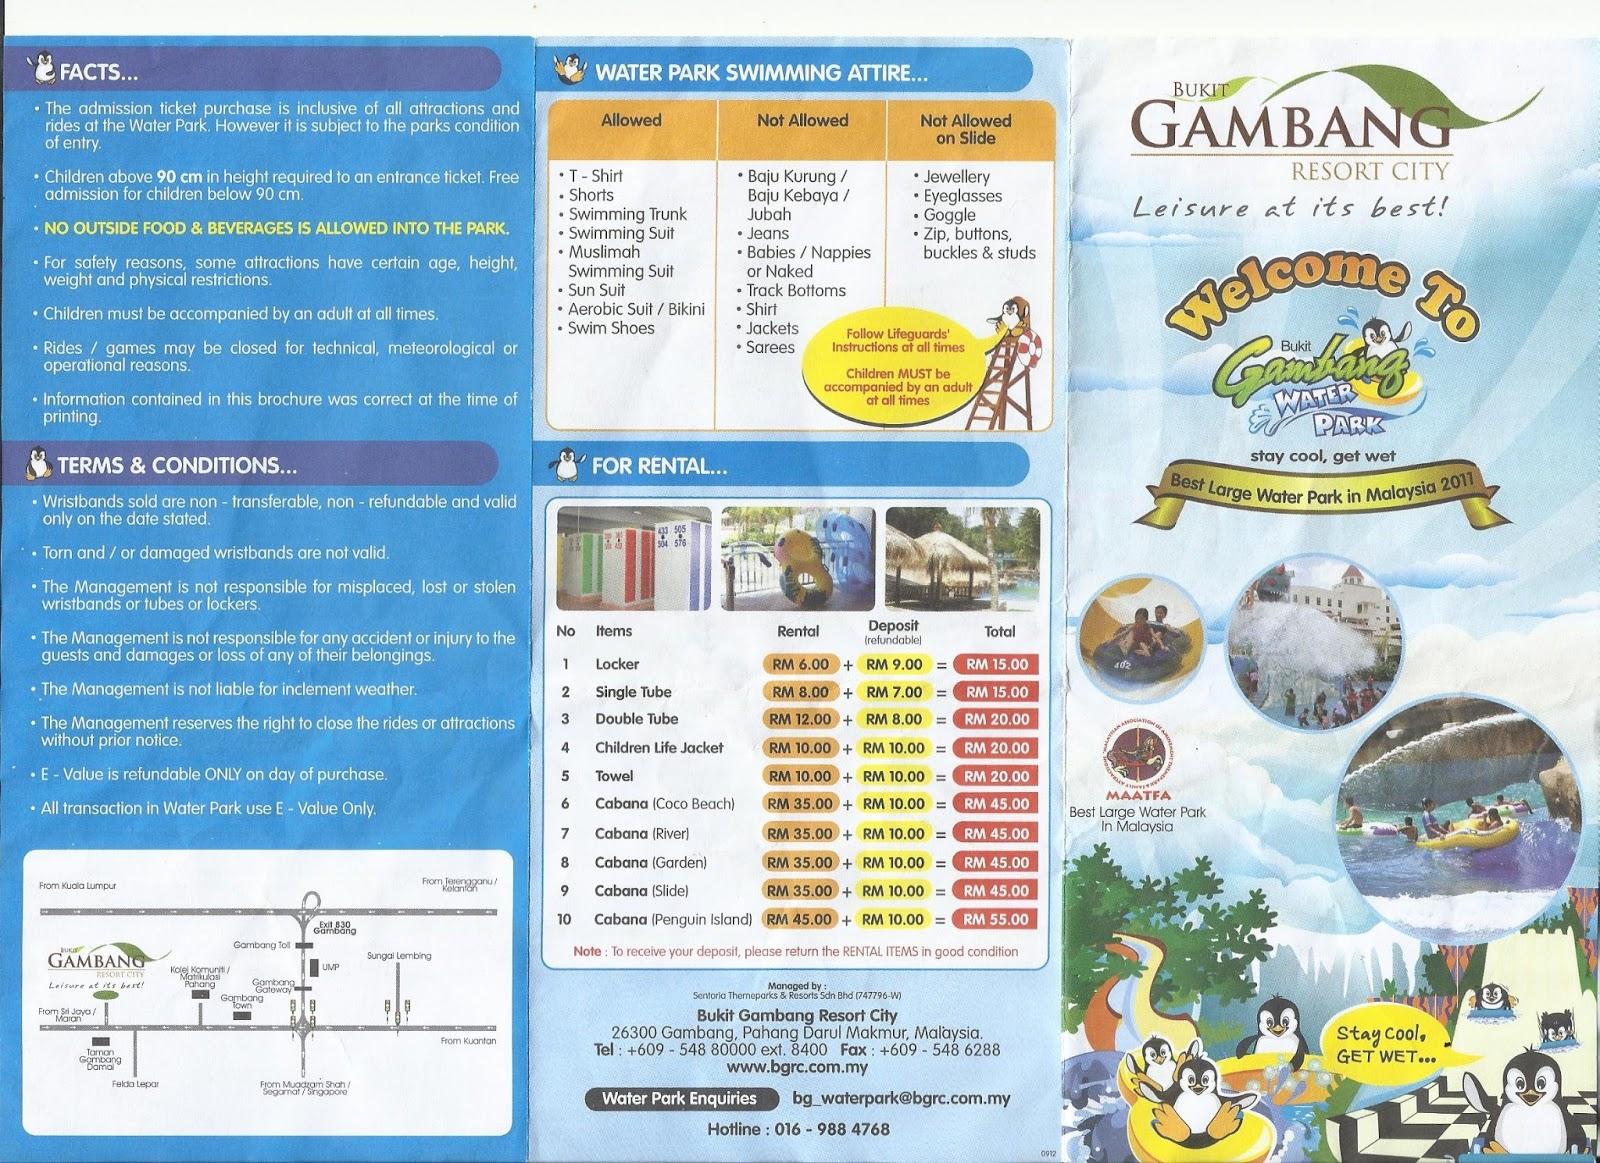 BUKIT GAMBANG RESORT MENGIKUT PAMPLETE YANG DIBERI PADA JUN 2013